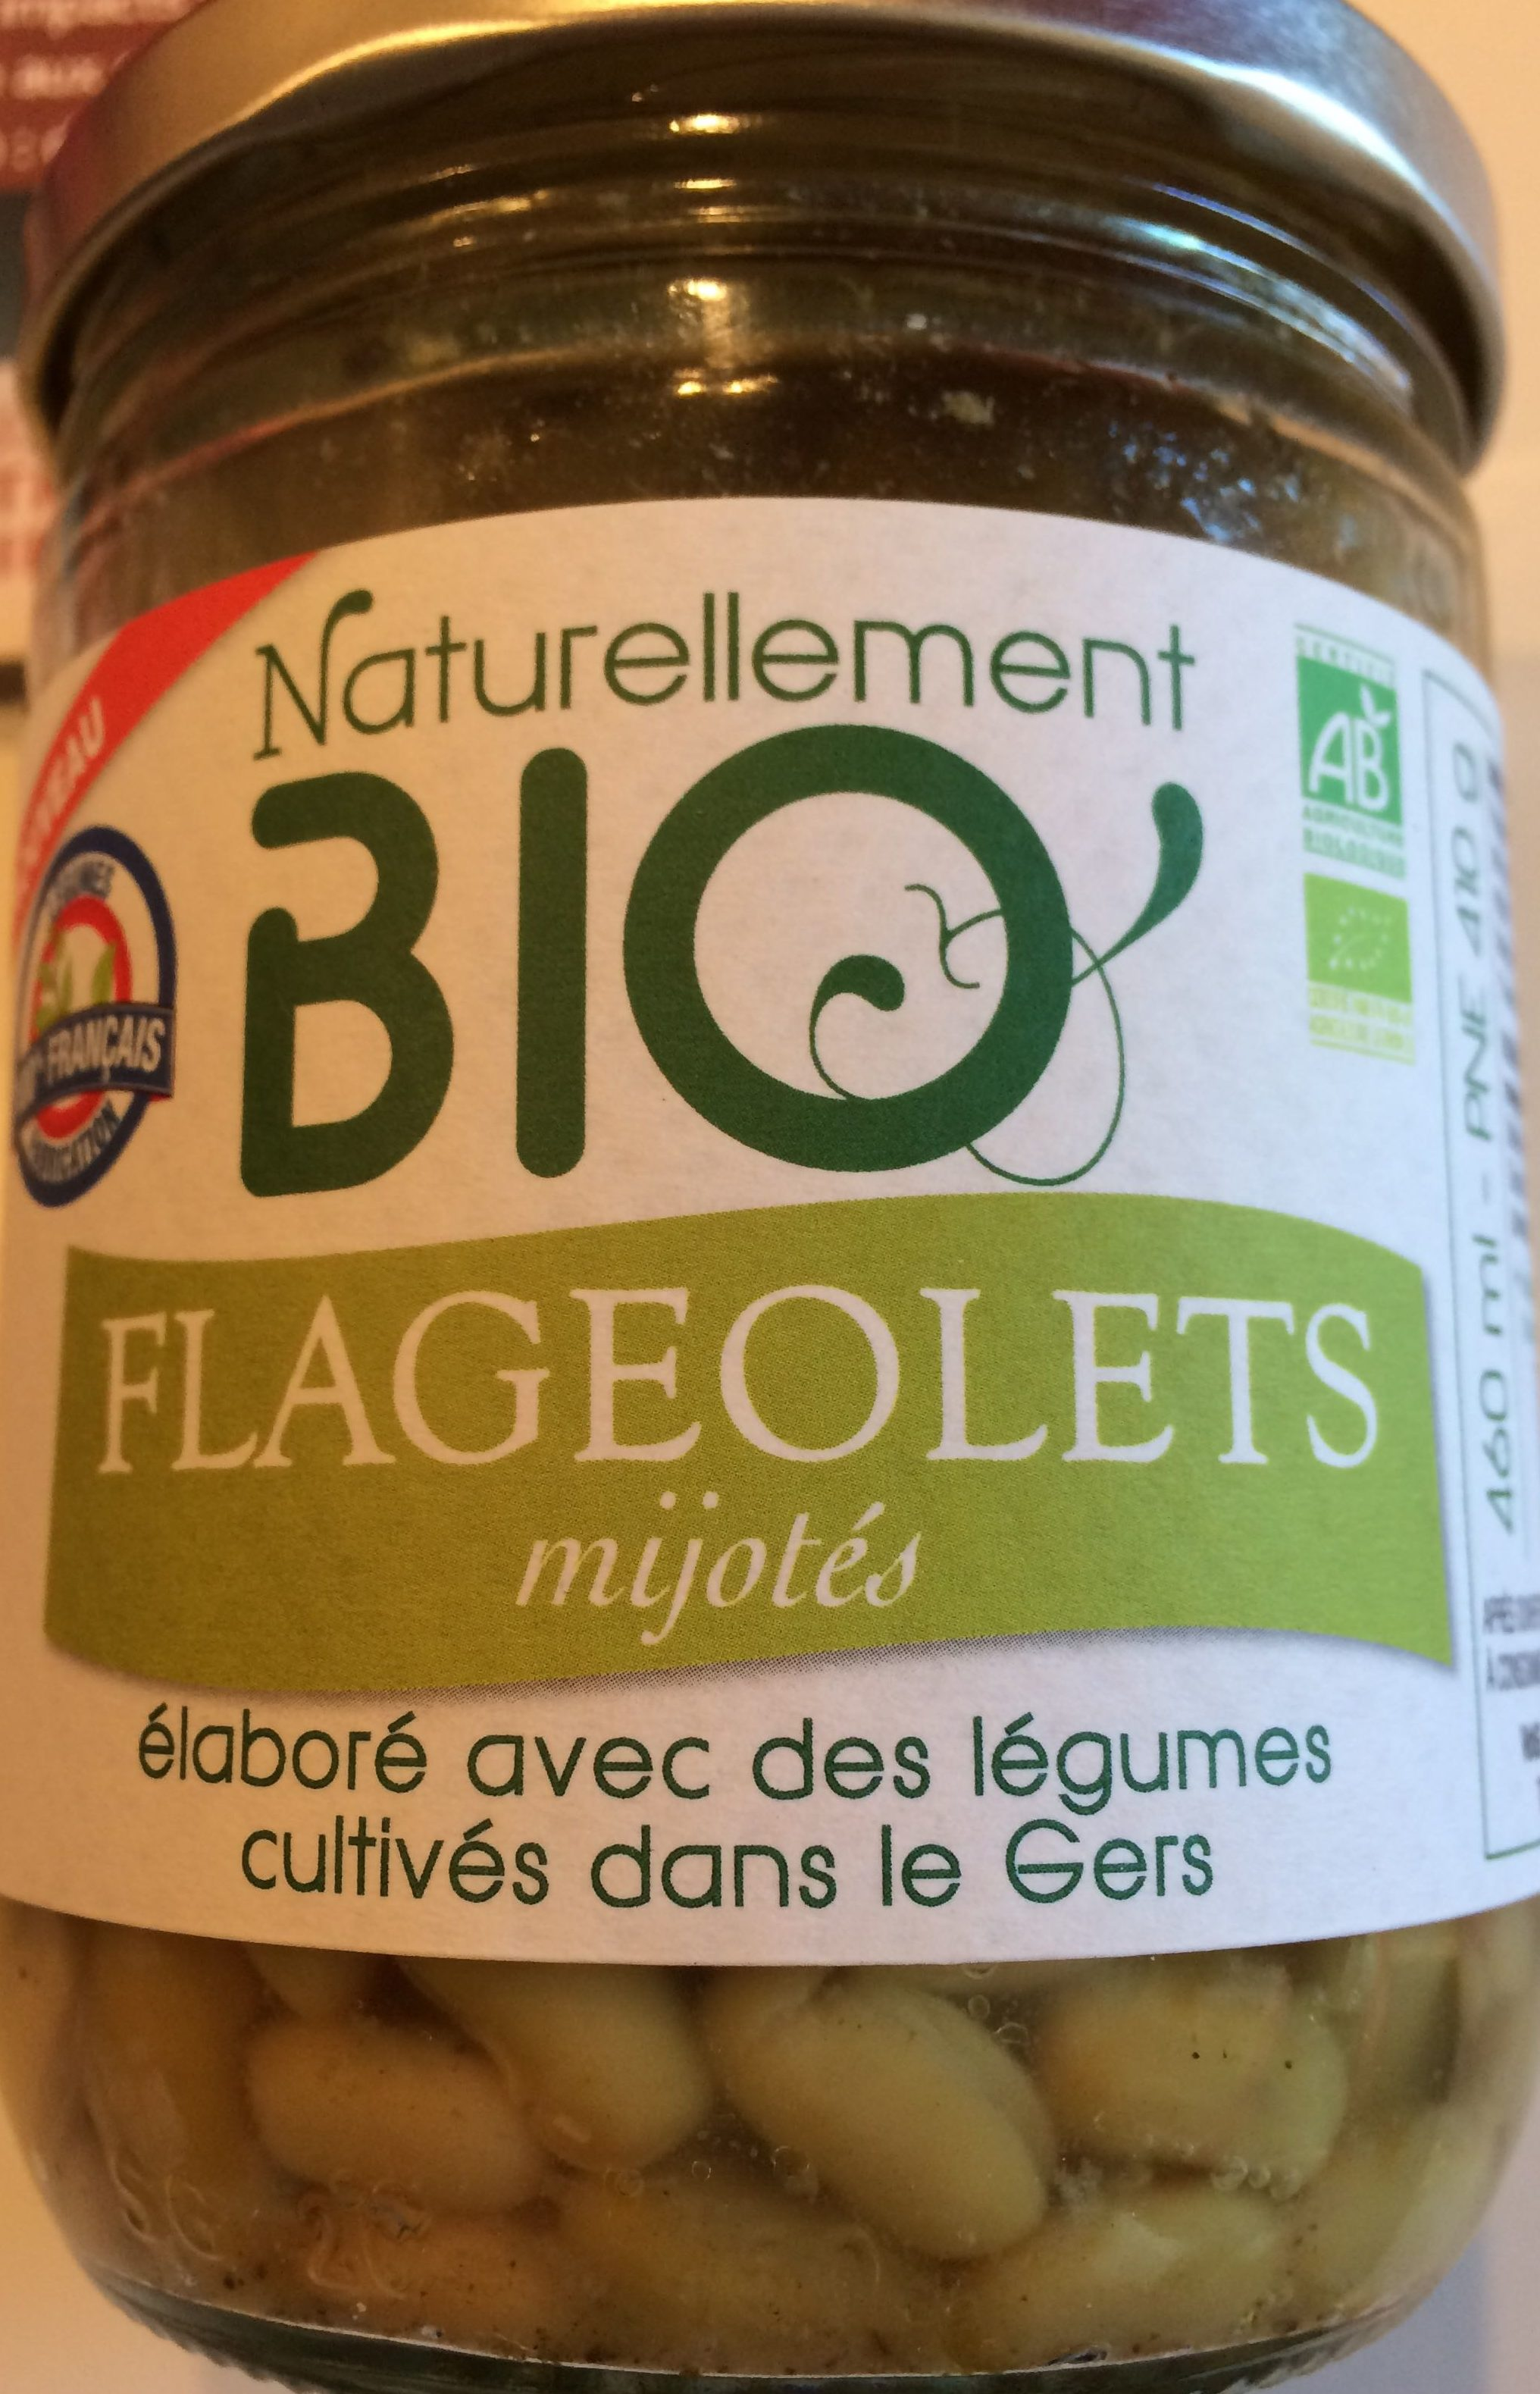 Flageolets mijotés - Produit